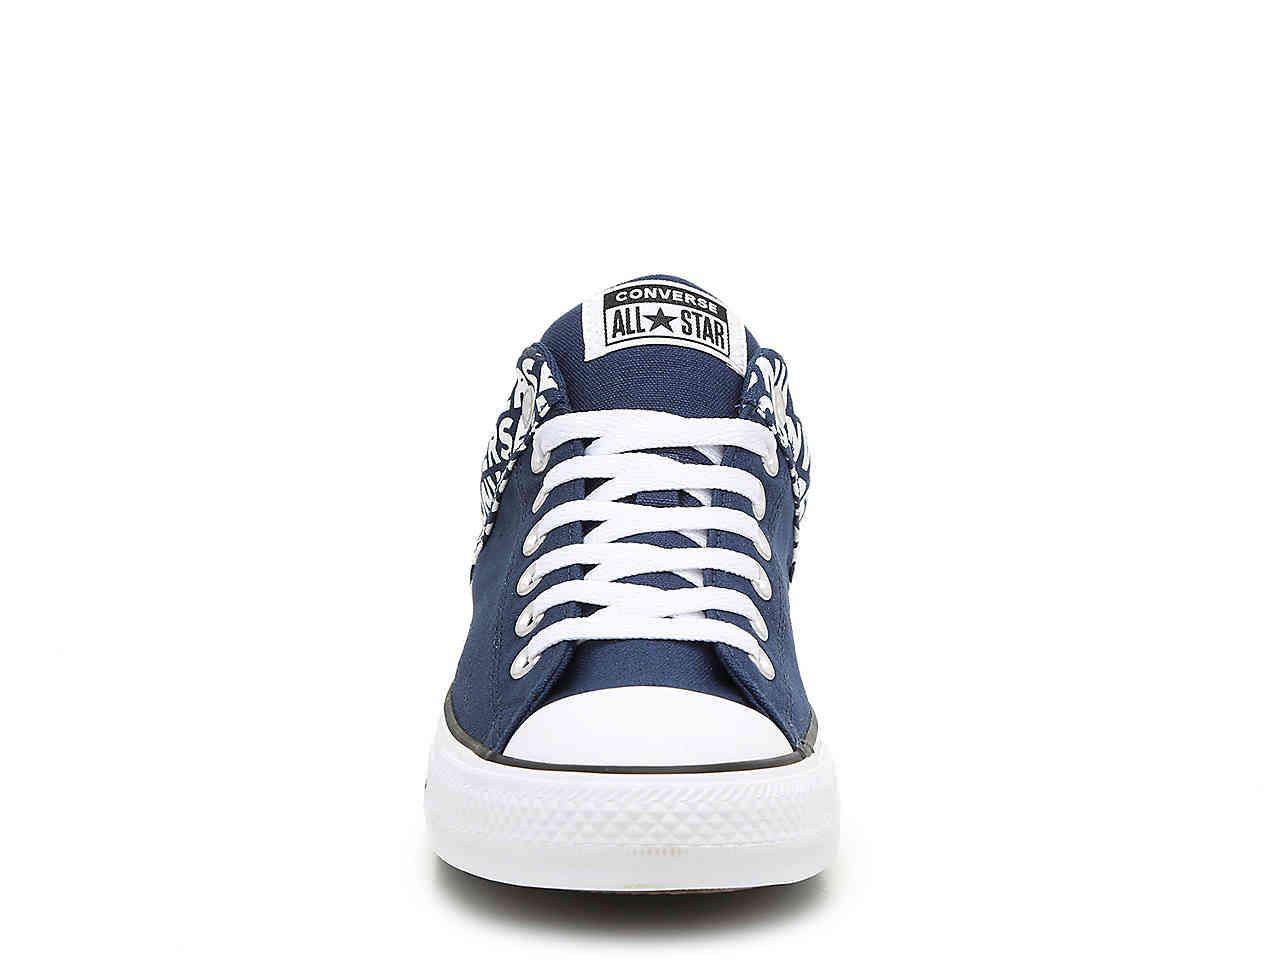 a3c5f2dc9bcac1 Converse - Blue Chuck Taylor All Star Hi Street Sneaker for Men - Lyst.  View fullscreen